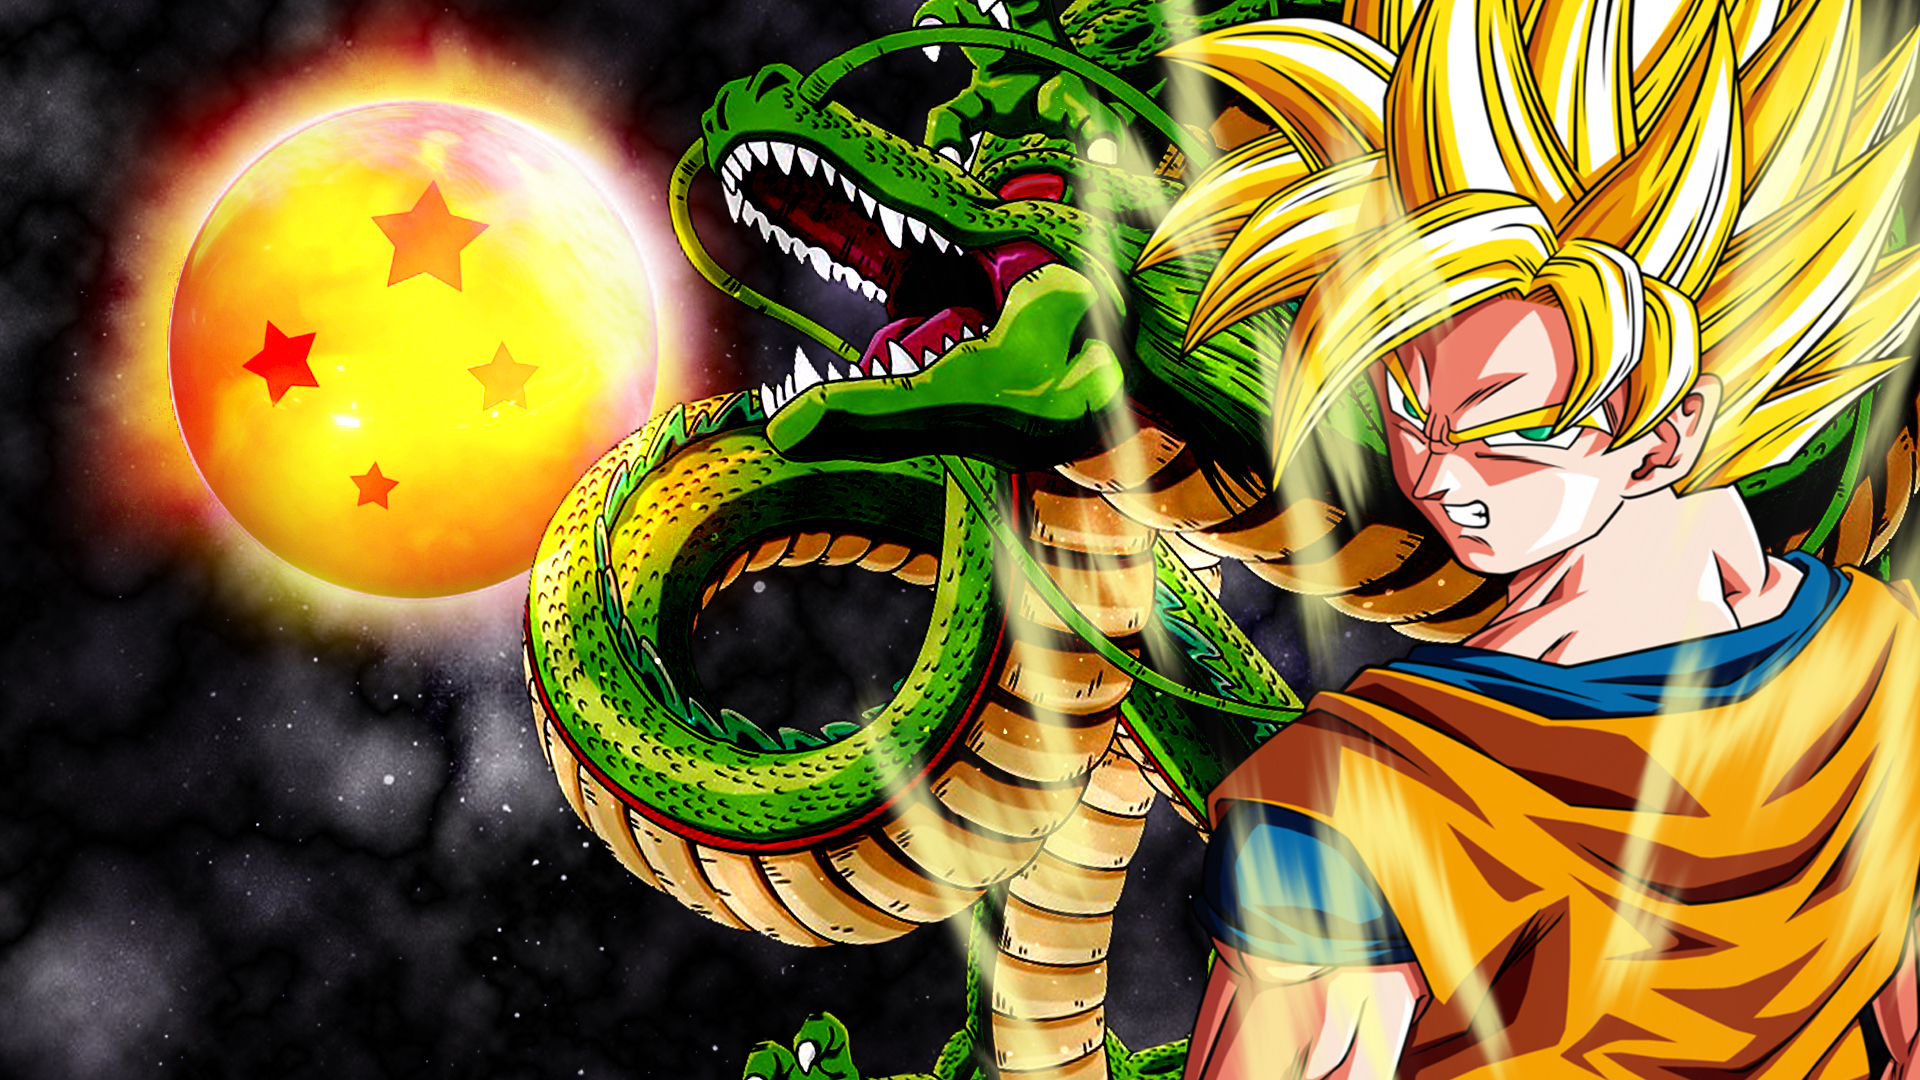 Goku ssj wallpaper by vuLC4no 1920x1080